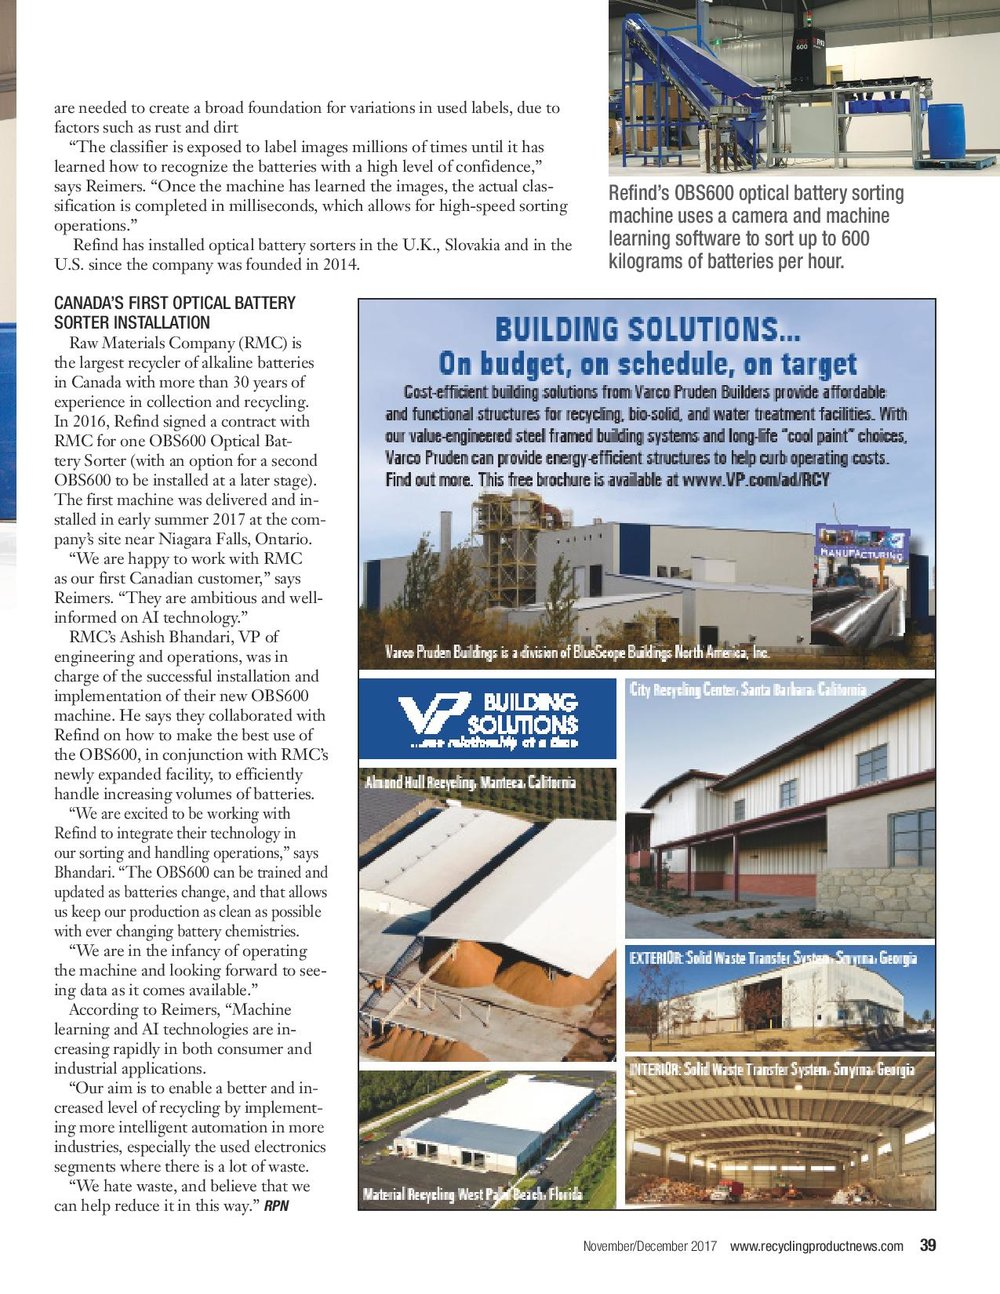 RPN NovDec 2017 - Refind pg38-39-page-002.jpg